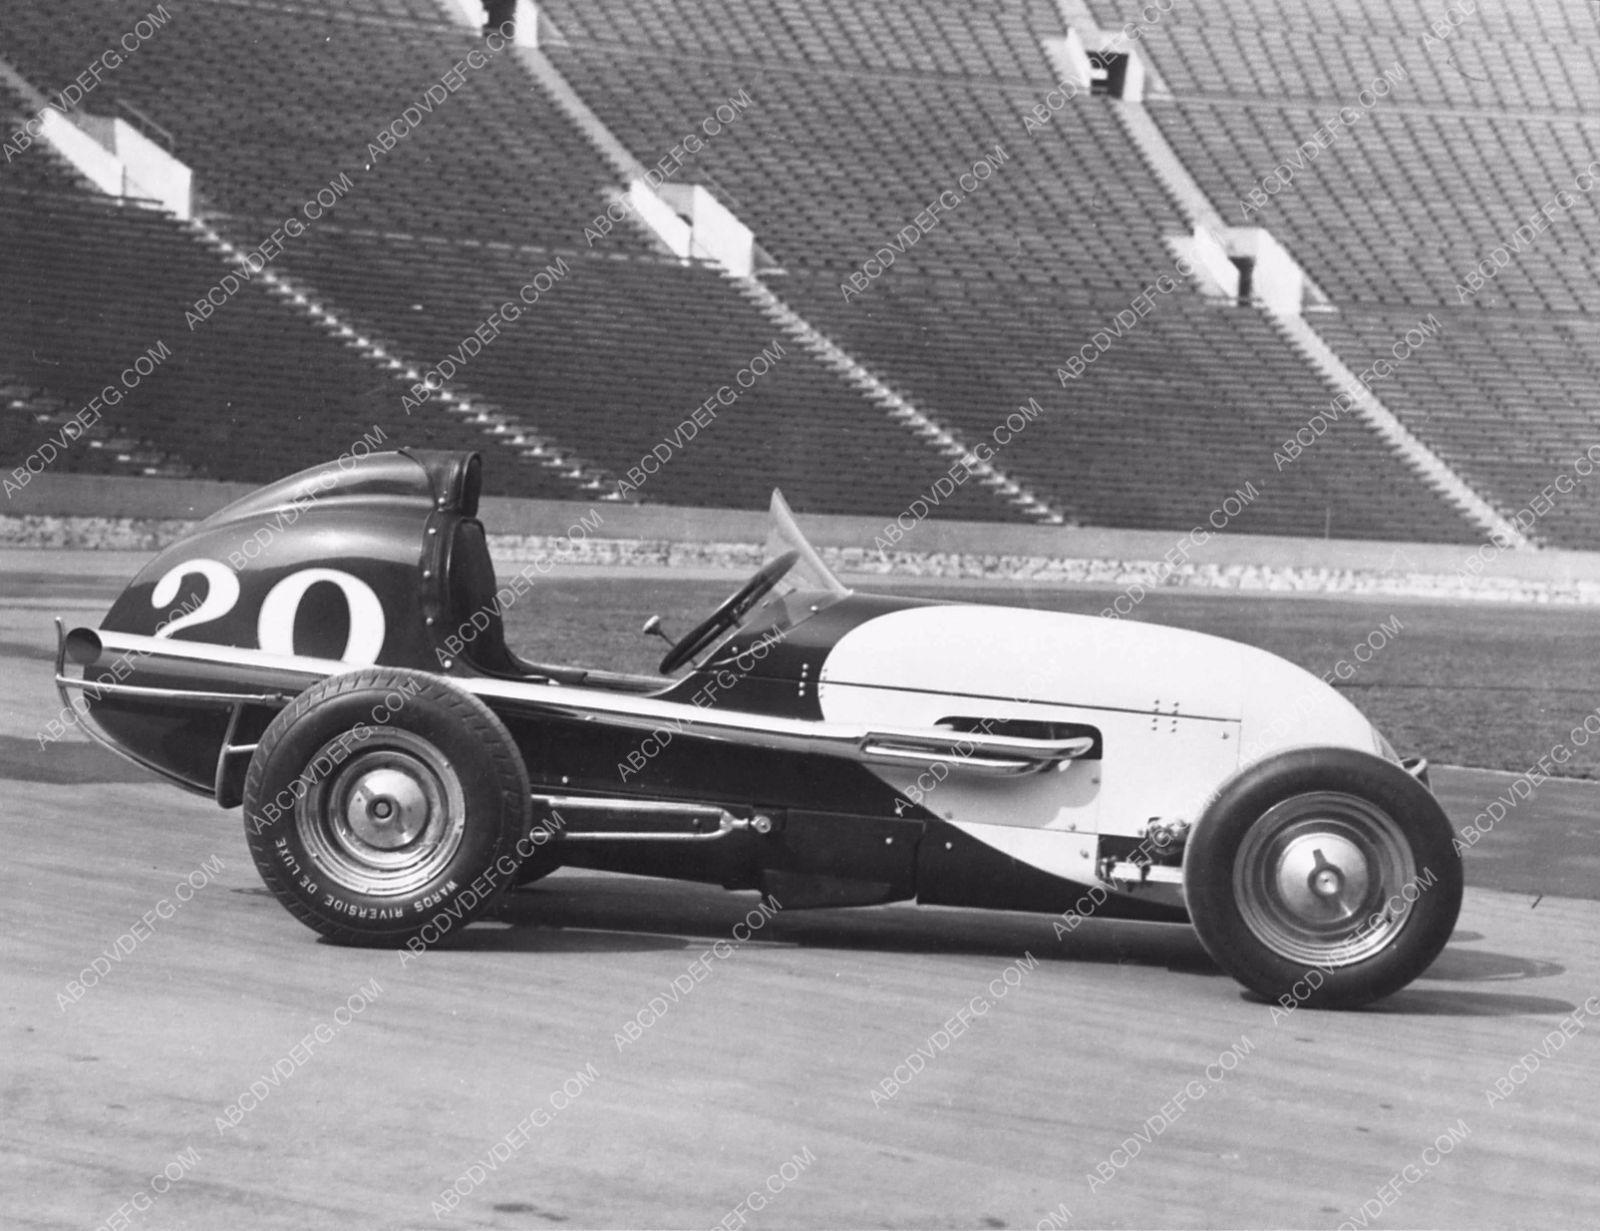 Midget drag racing photo 694